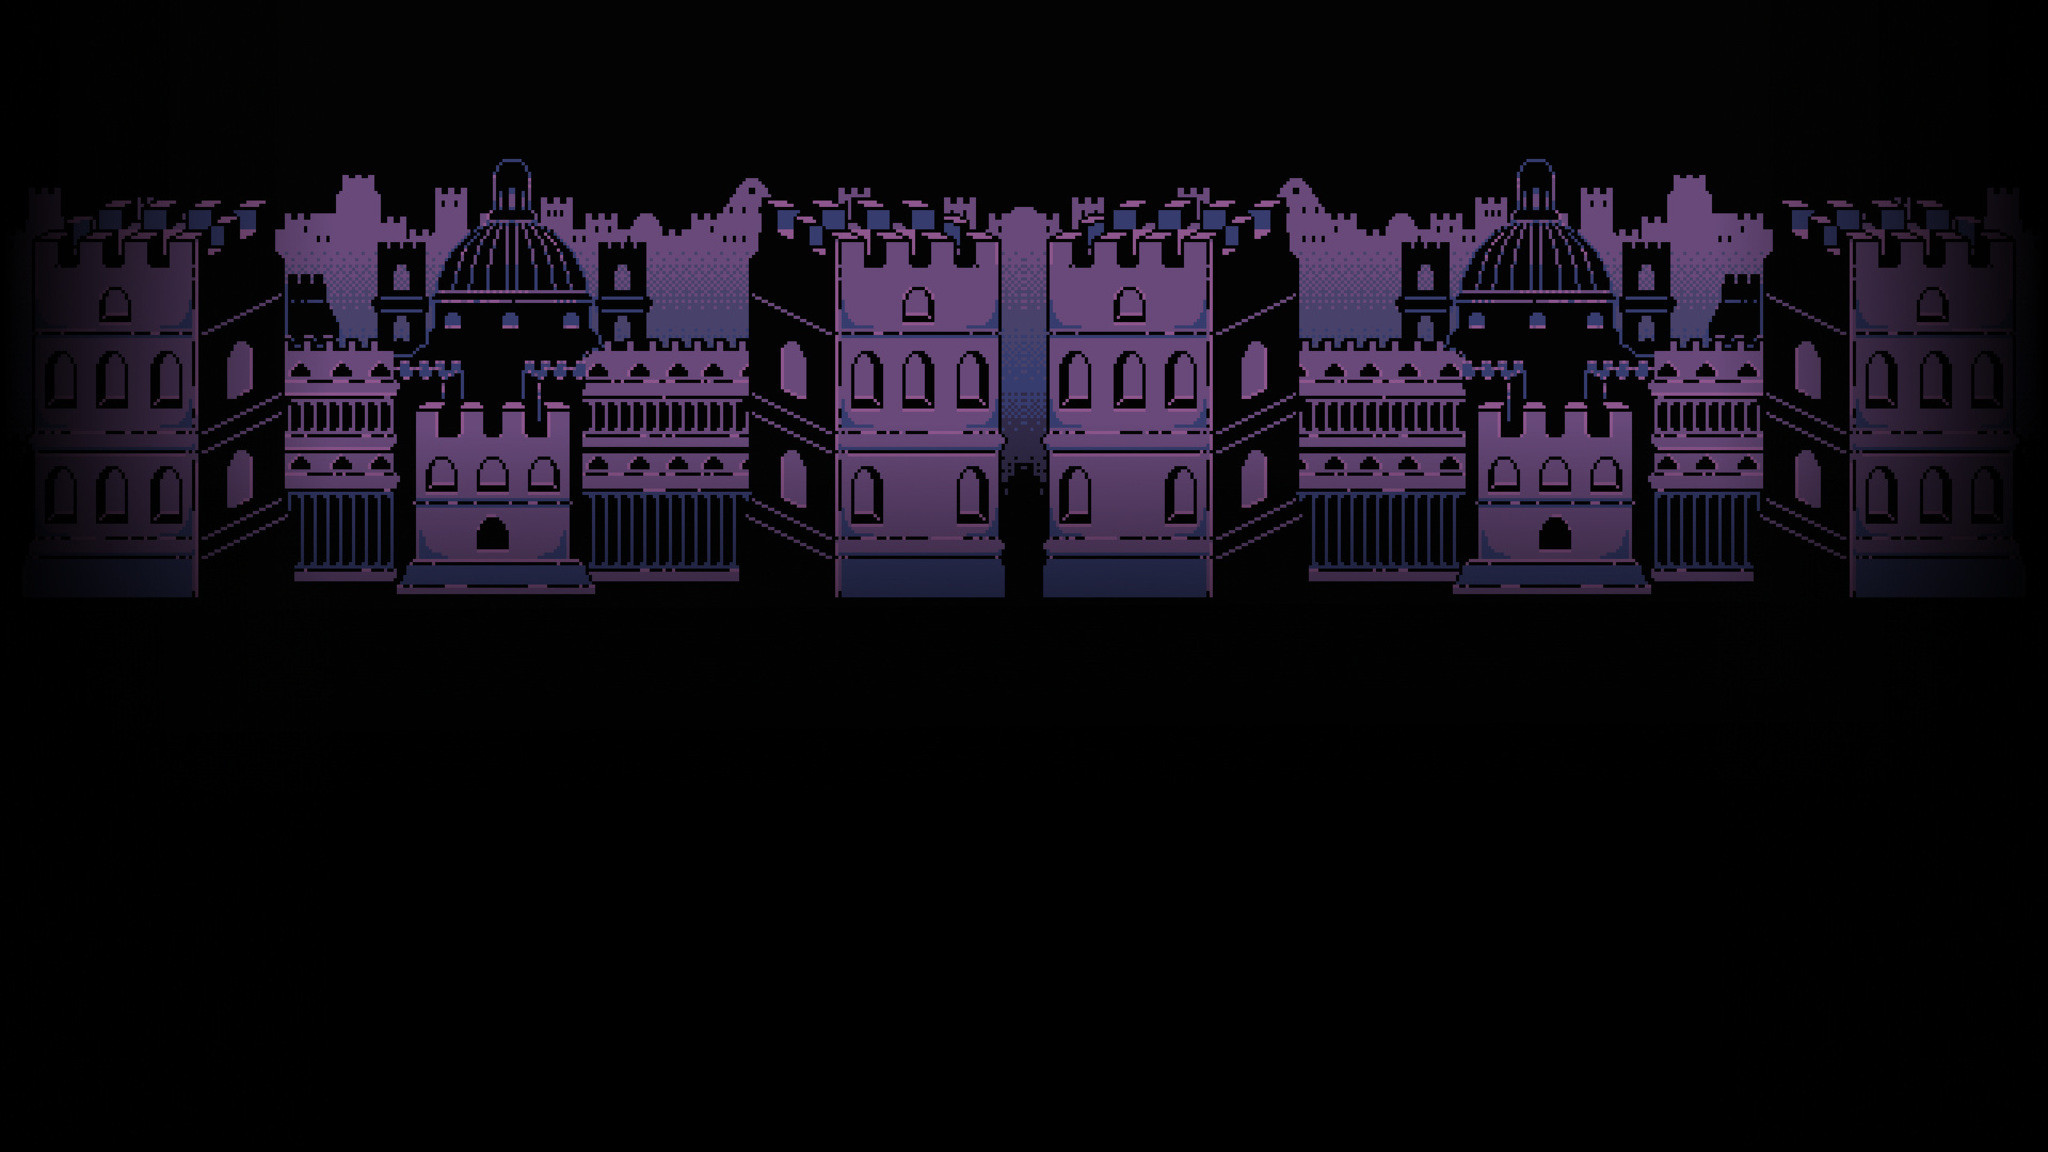 Download Undertale Game HD 4k Wallpapers In .